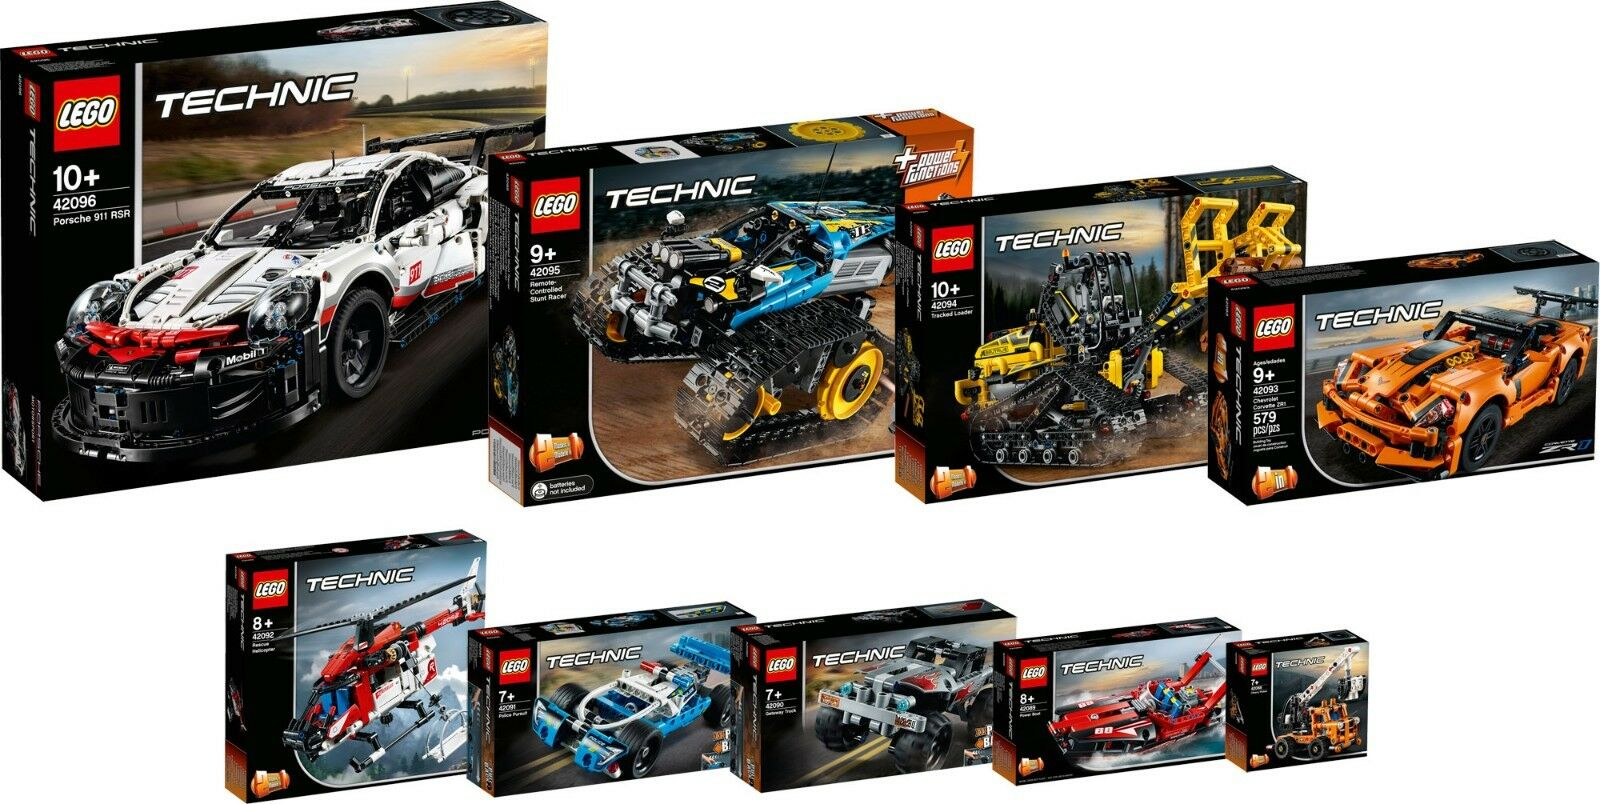 LEGO Technic 42096 42095 42094 42093 42092 42091 42090 42089 42088 prevendita